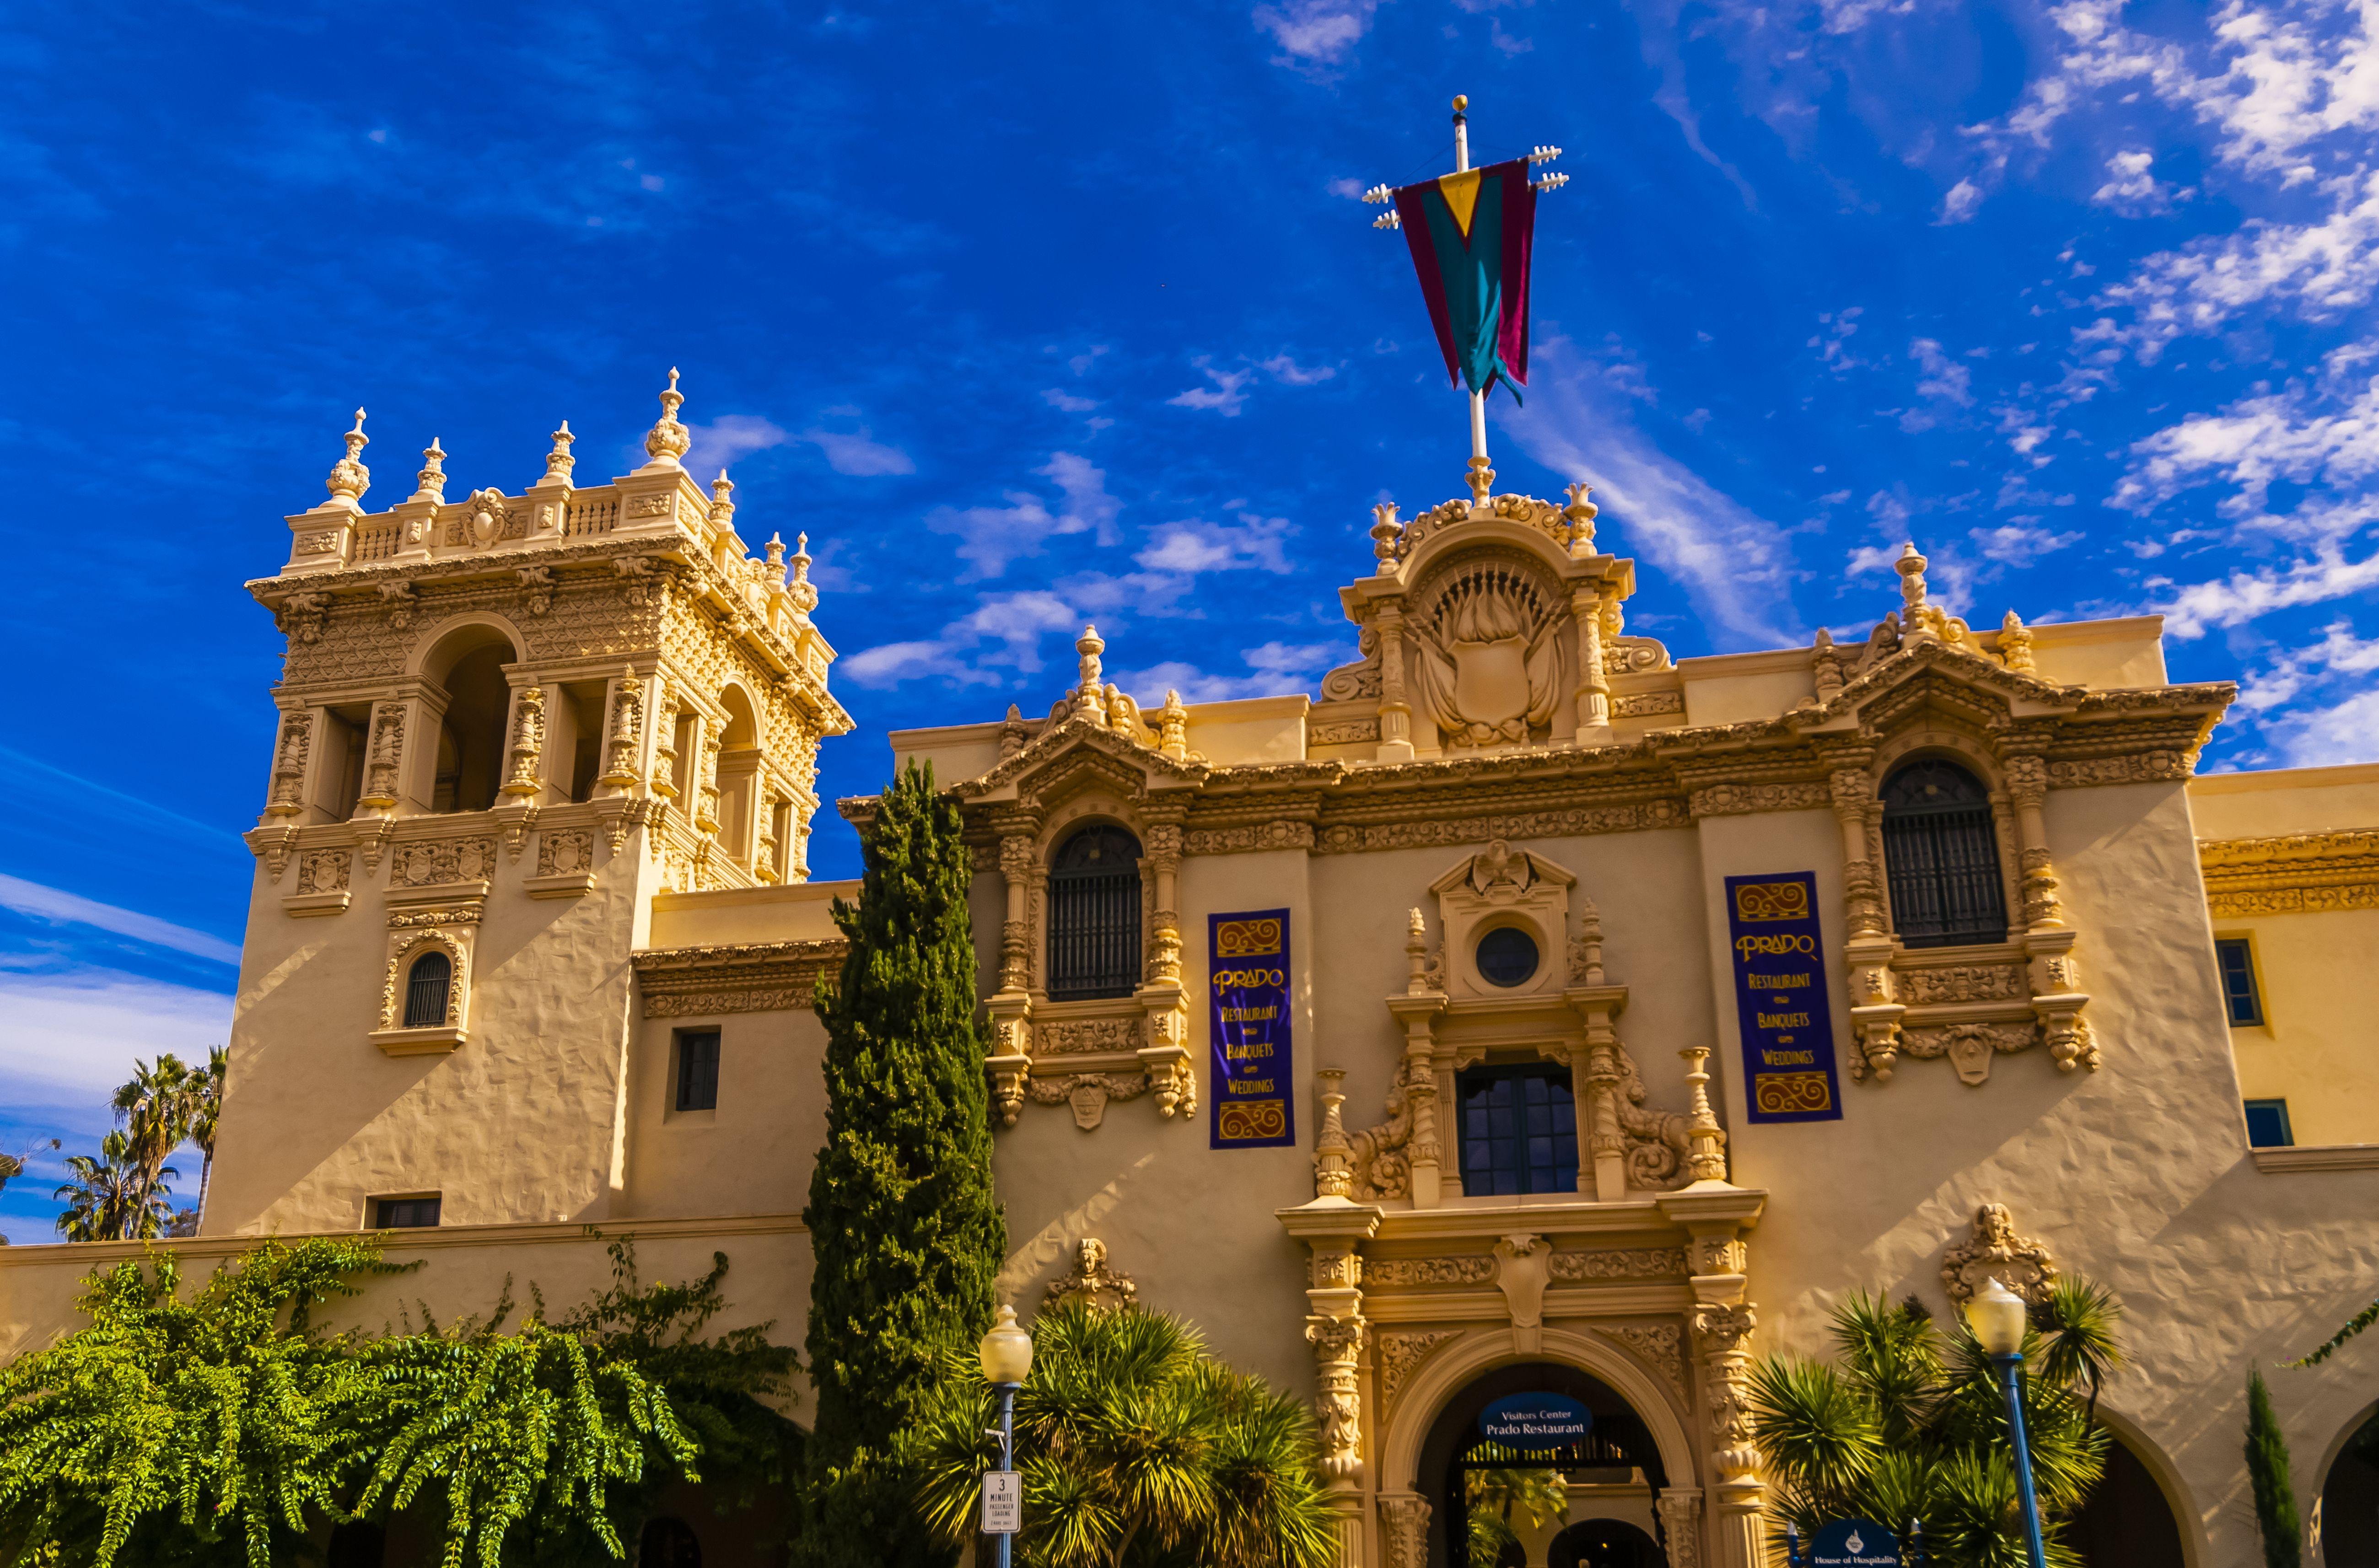 House of Hospitality, Balboa Park, San Diego, California USA.